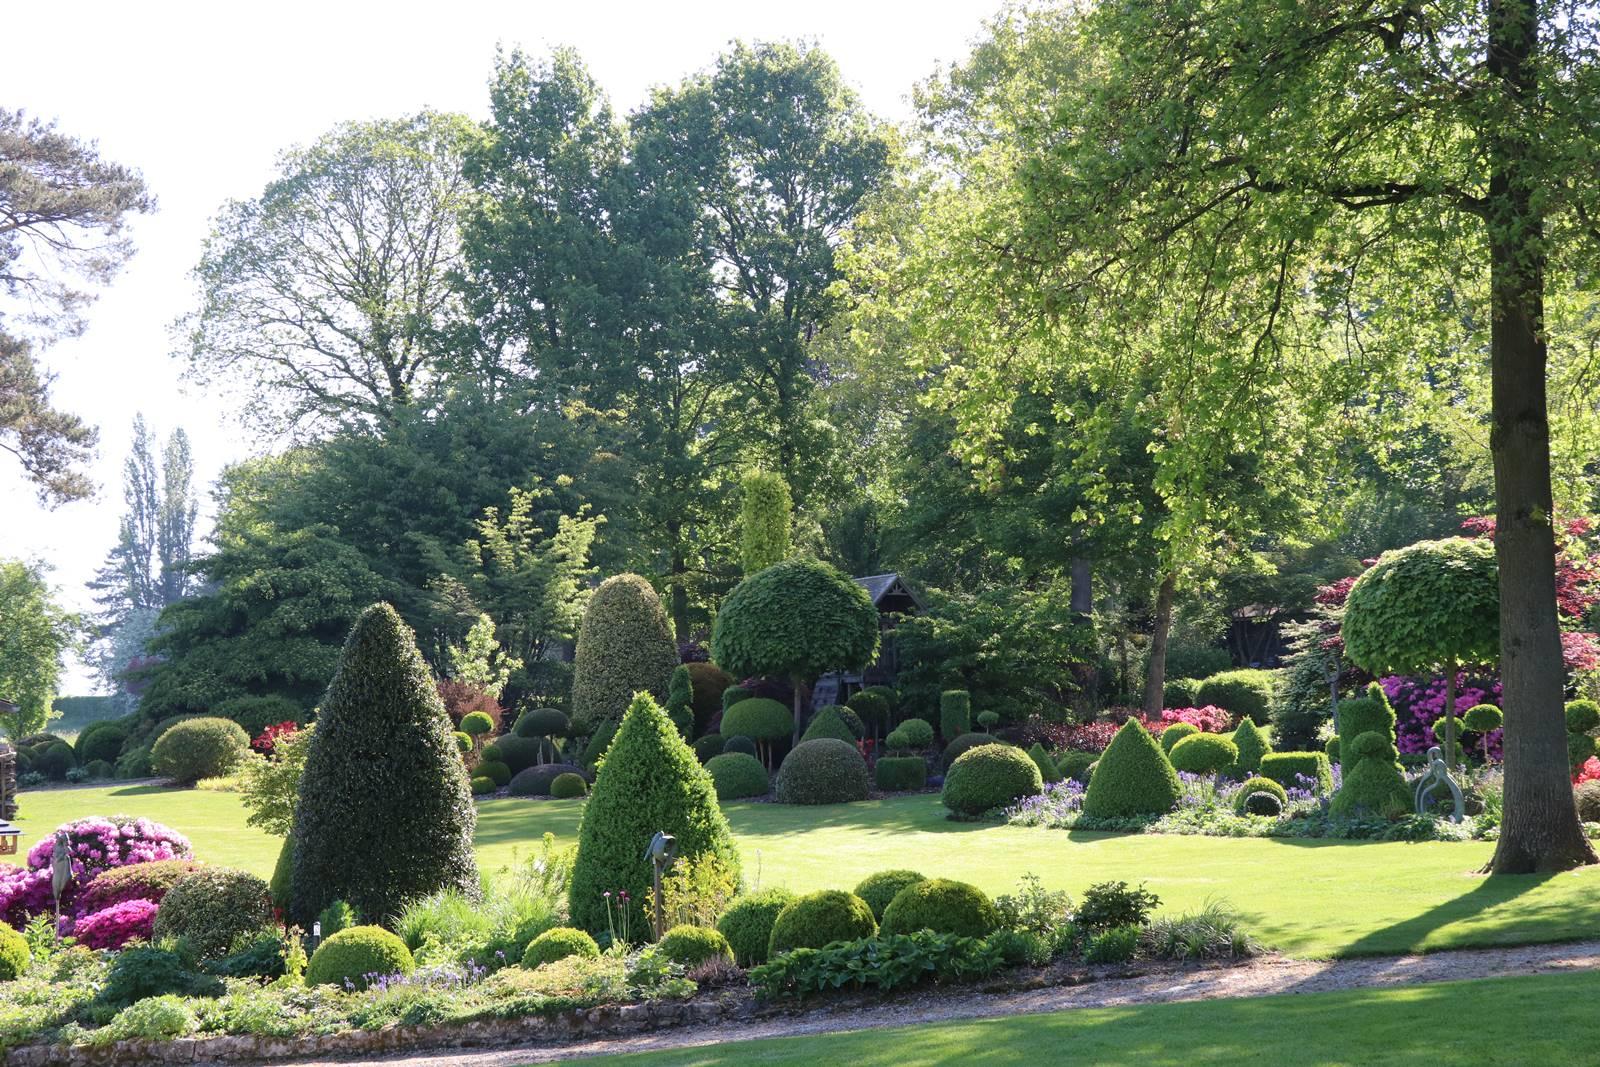 Vieux Manant jardin printemps